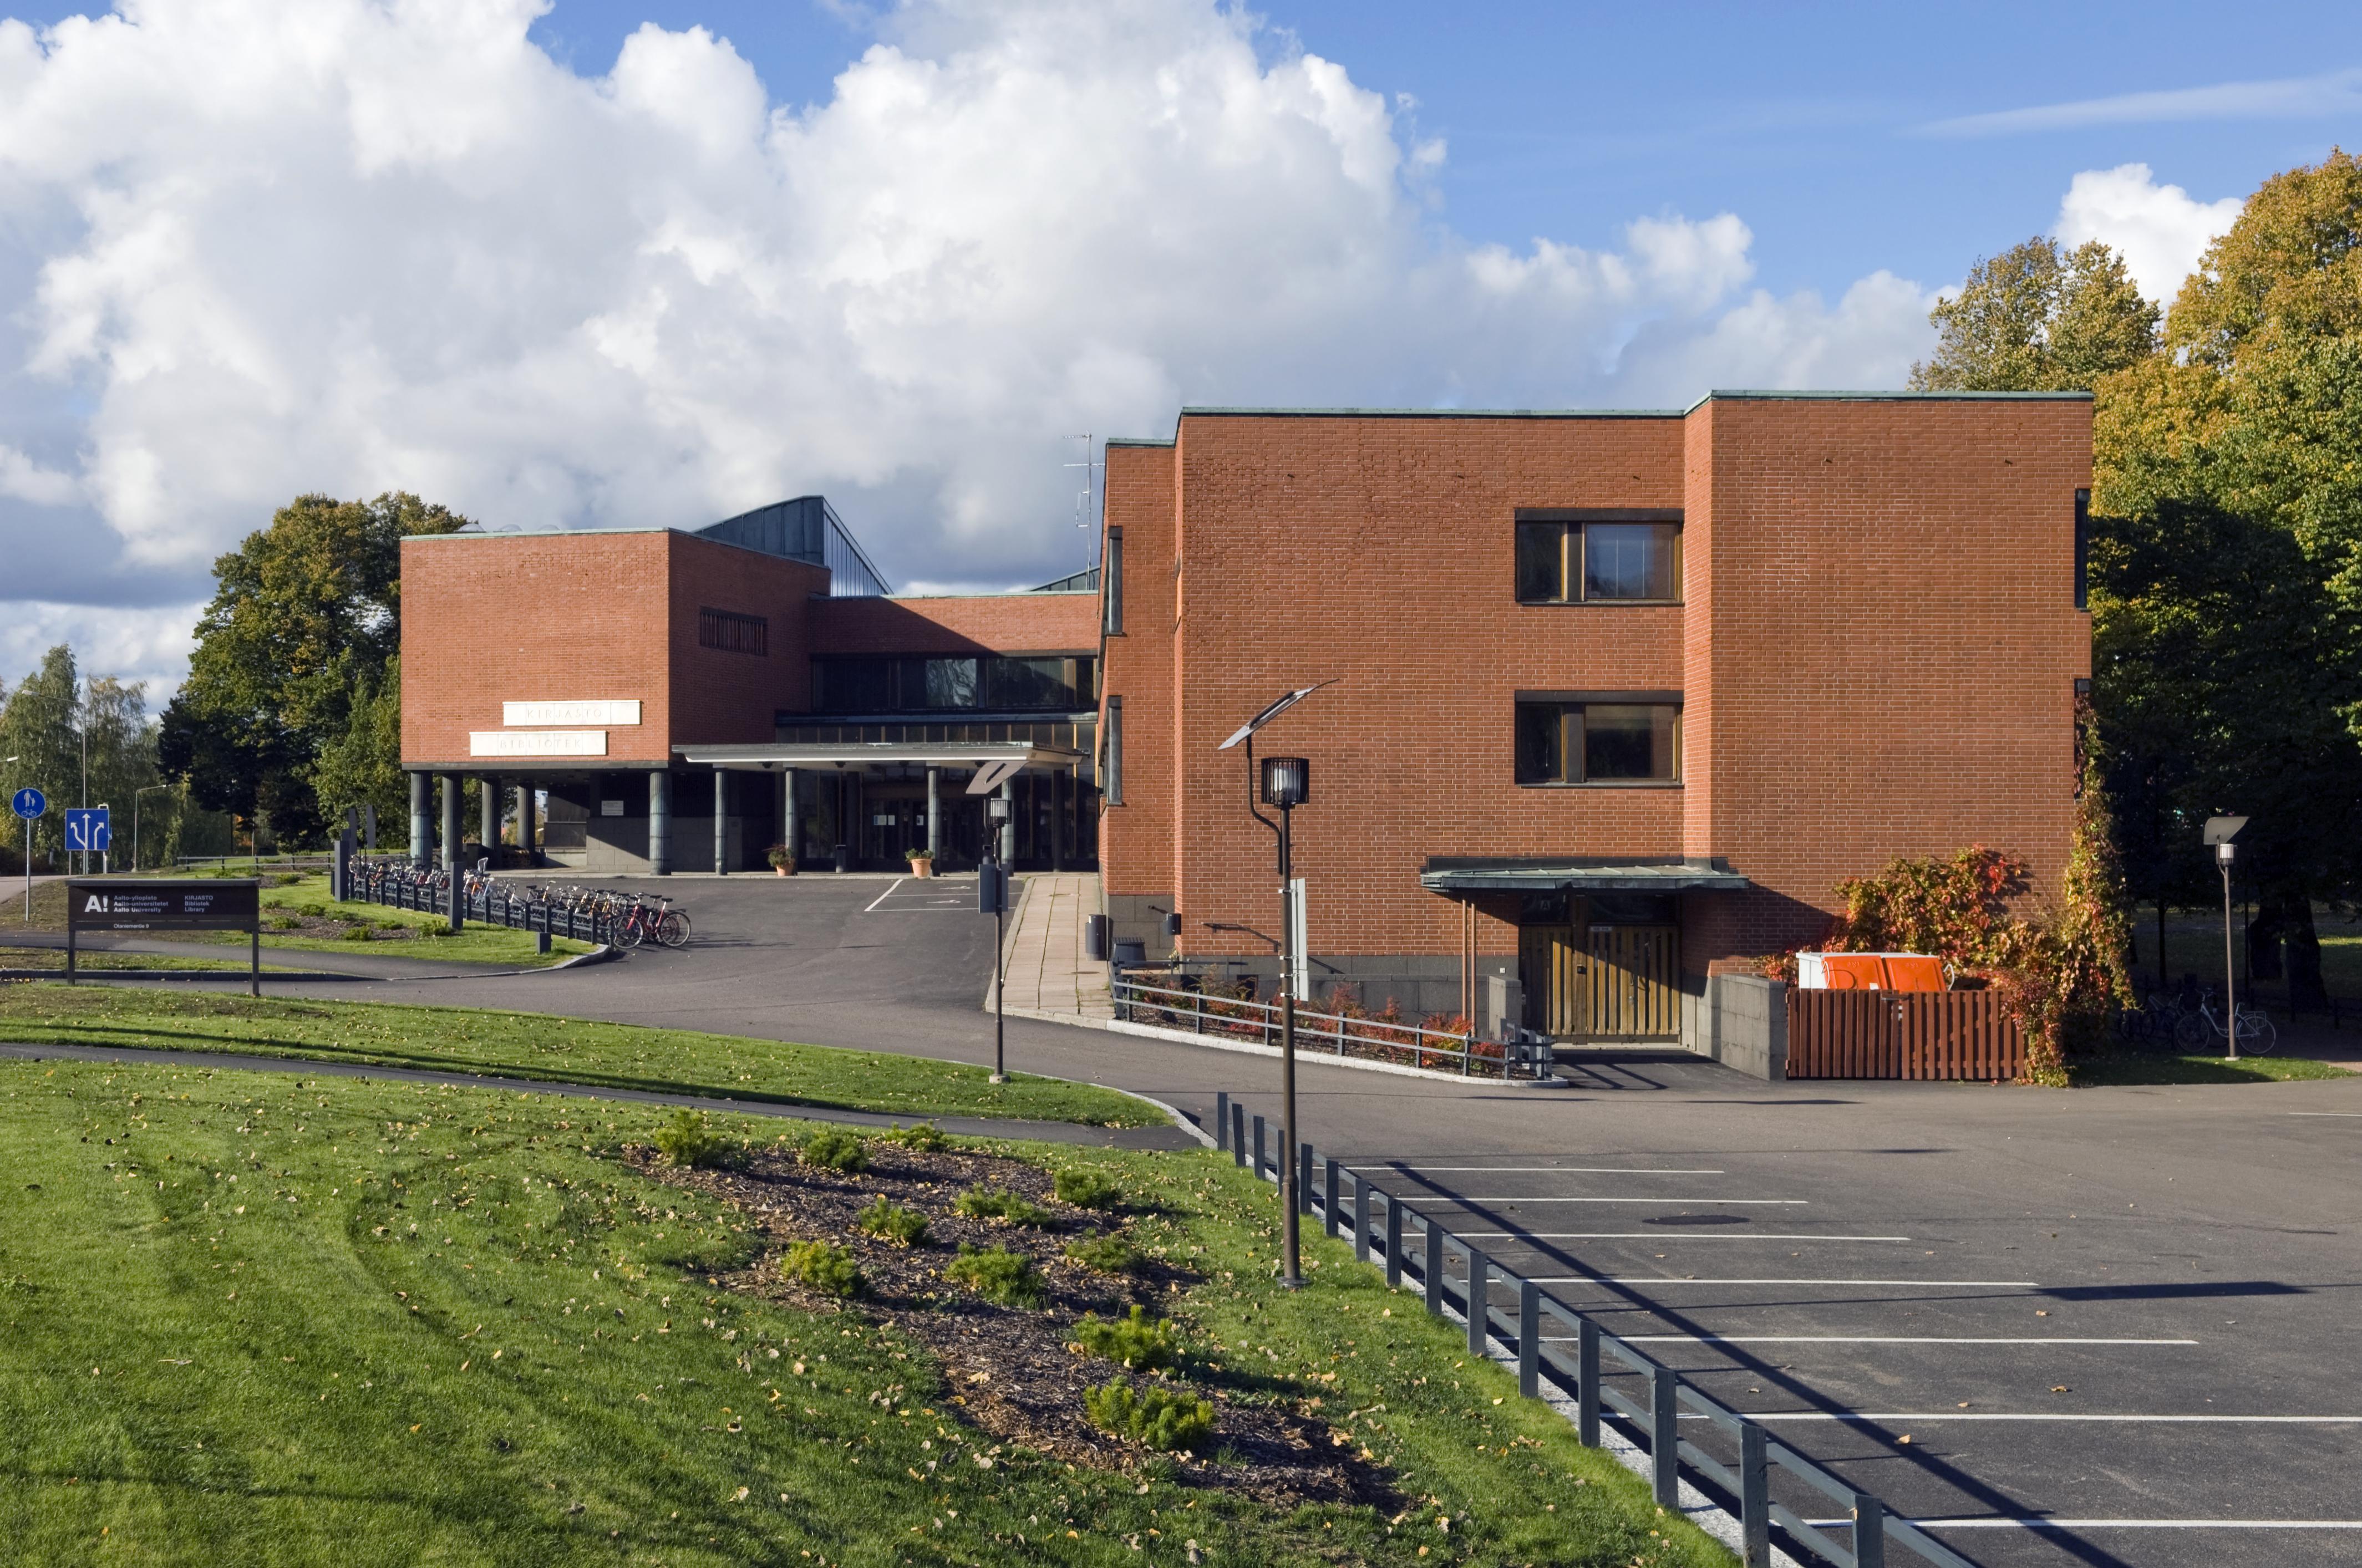 Tiedosto:Aalto University Otaniemi Campus Library October 7 2012 01.png – Wikipedia